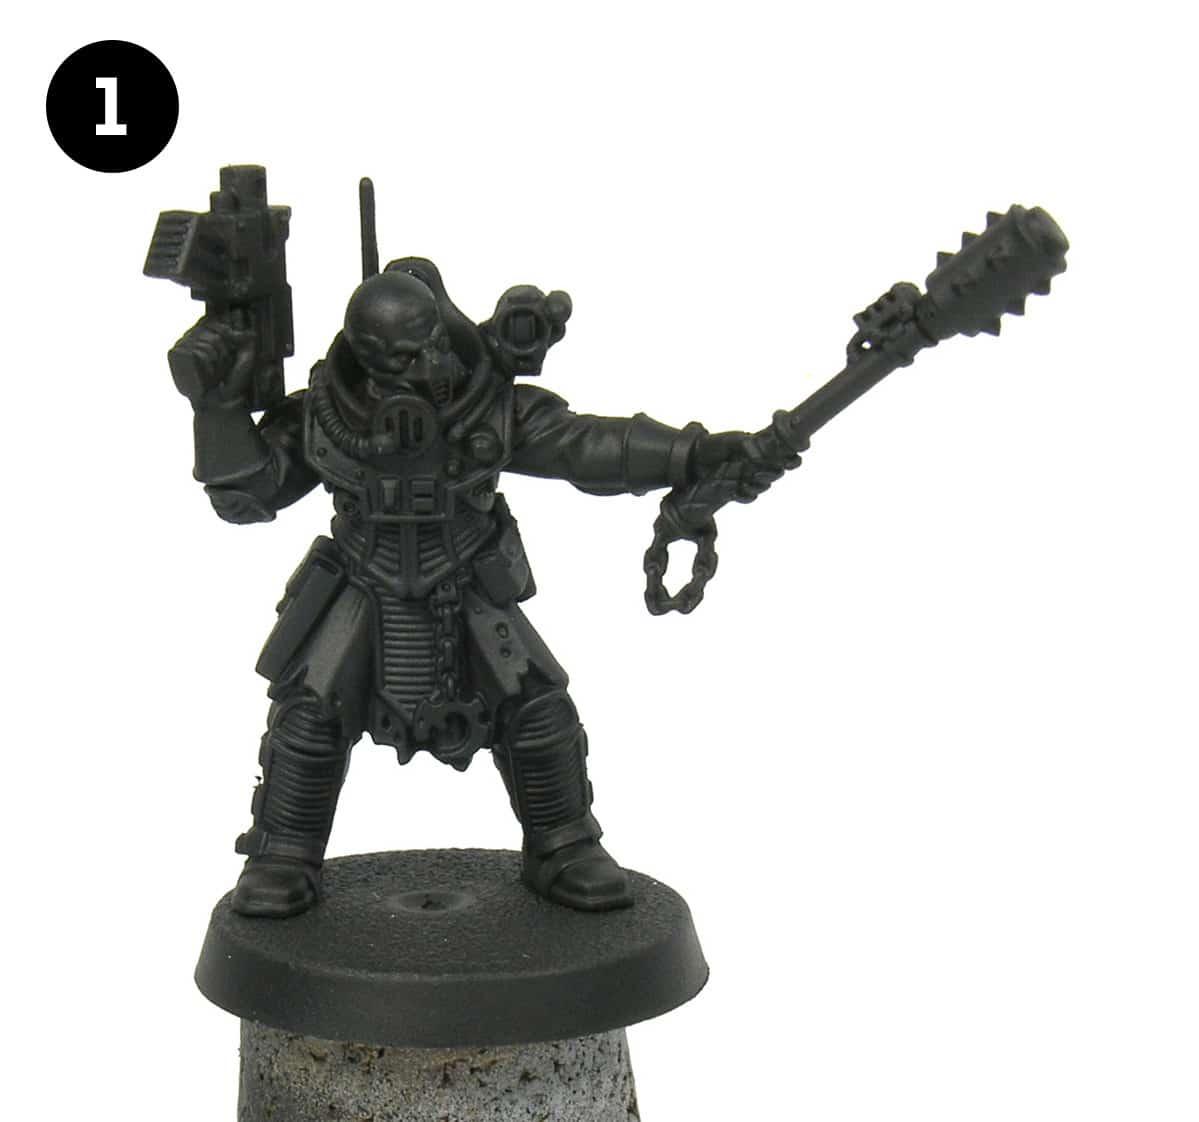 Culto robagenes - Genestealer Cult Warhammer 40,0000